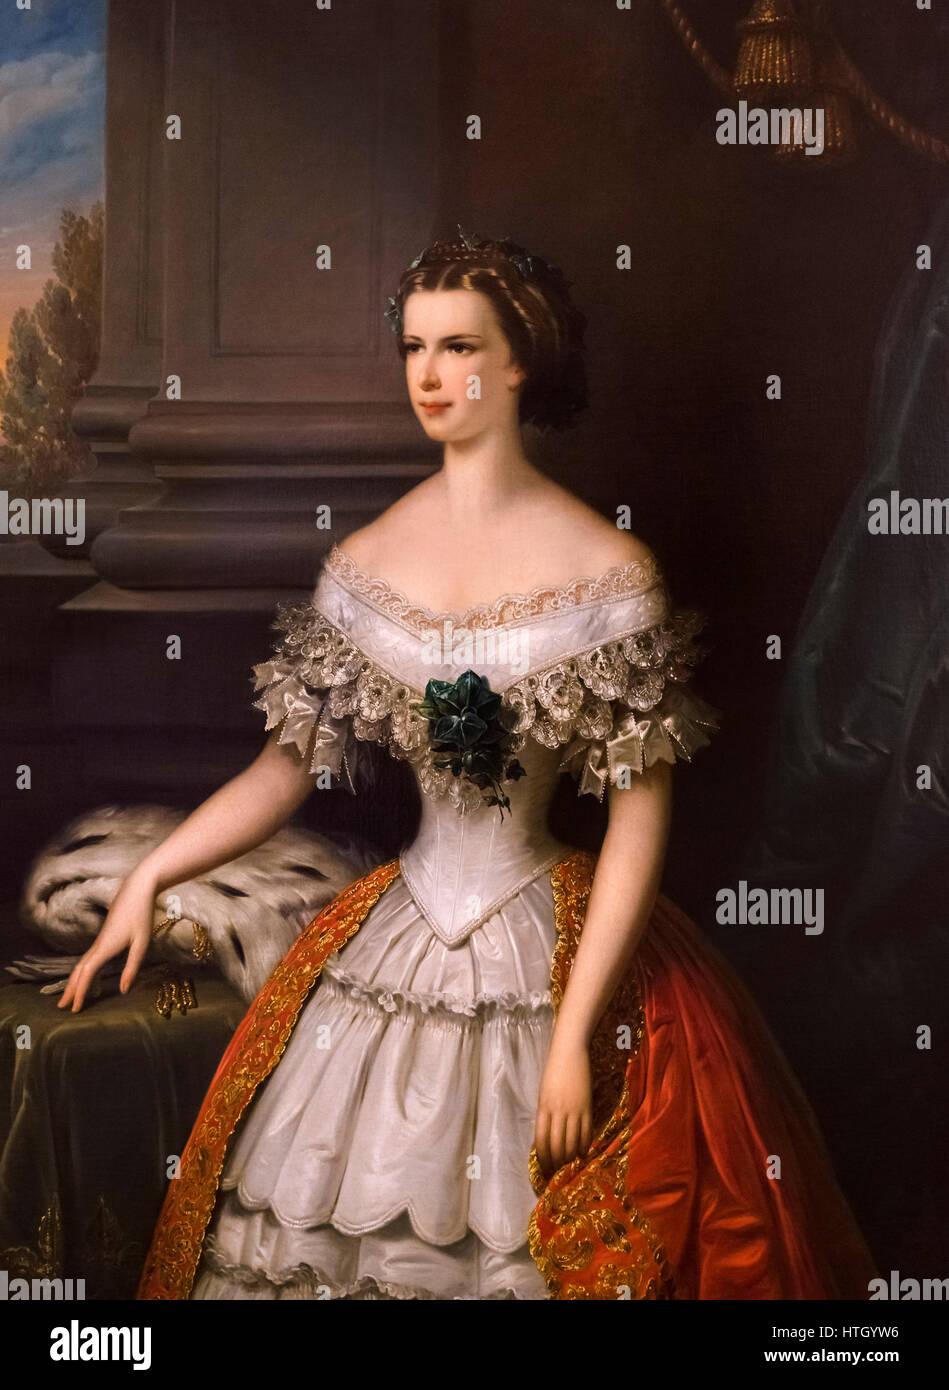 Sisi, portrait. Empress Elisabeth of Austria (1837-1898), known as Sisi, wife of Emperor Franz Joseph I. Painting - Stock Image